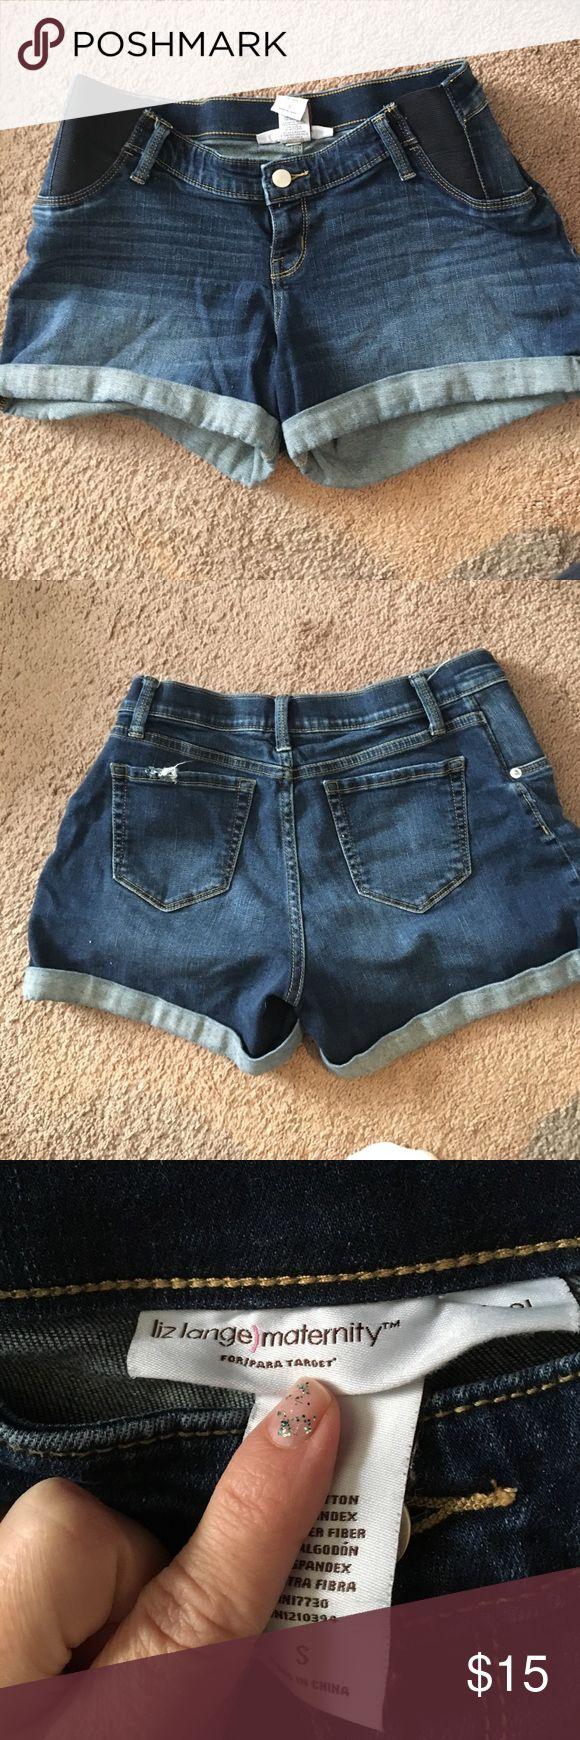 Liz Lange maternity shorts Super comfortable jean maternity shorts from Liz Lange Liz Lange Shorts Jean Shorts